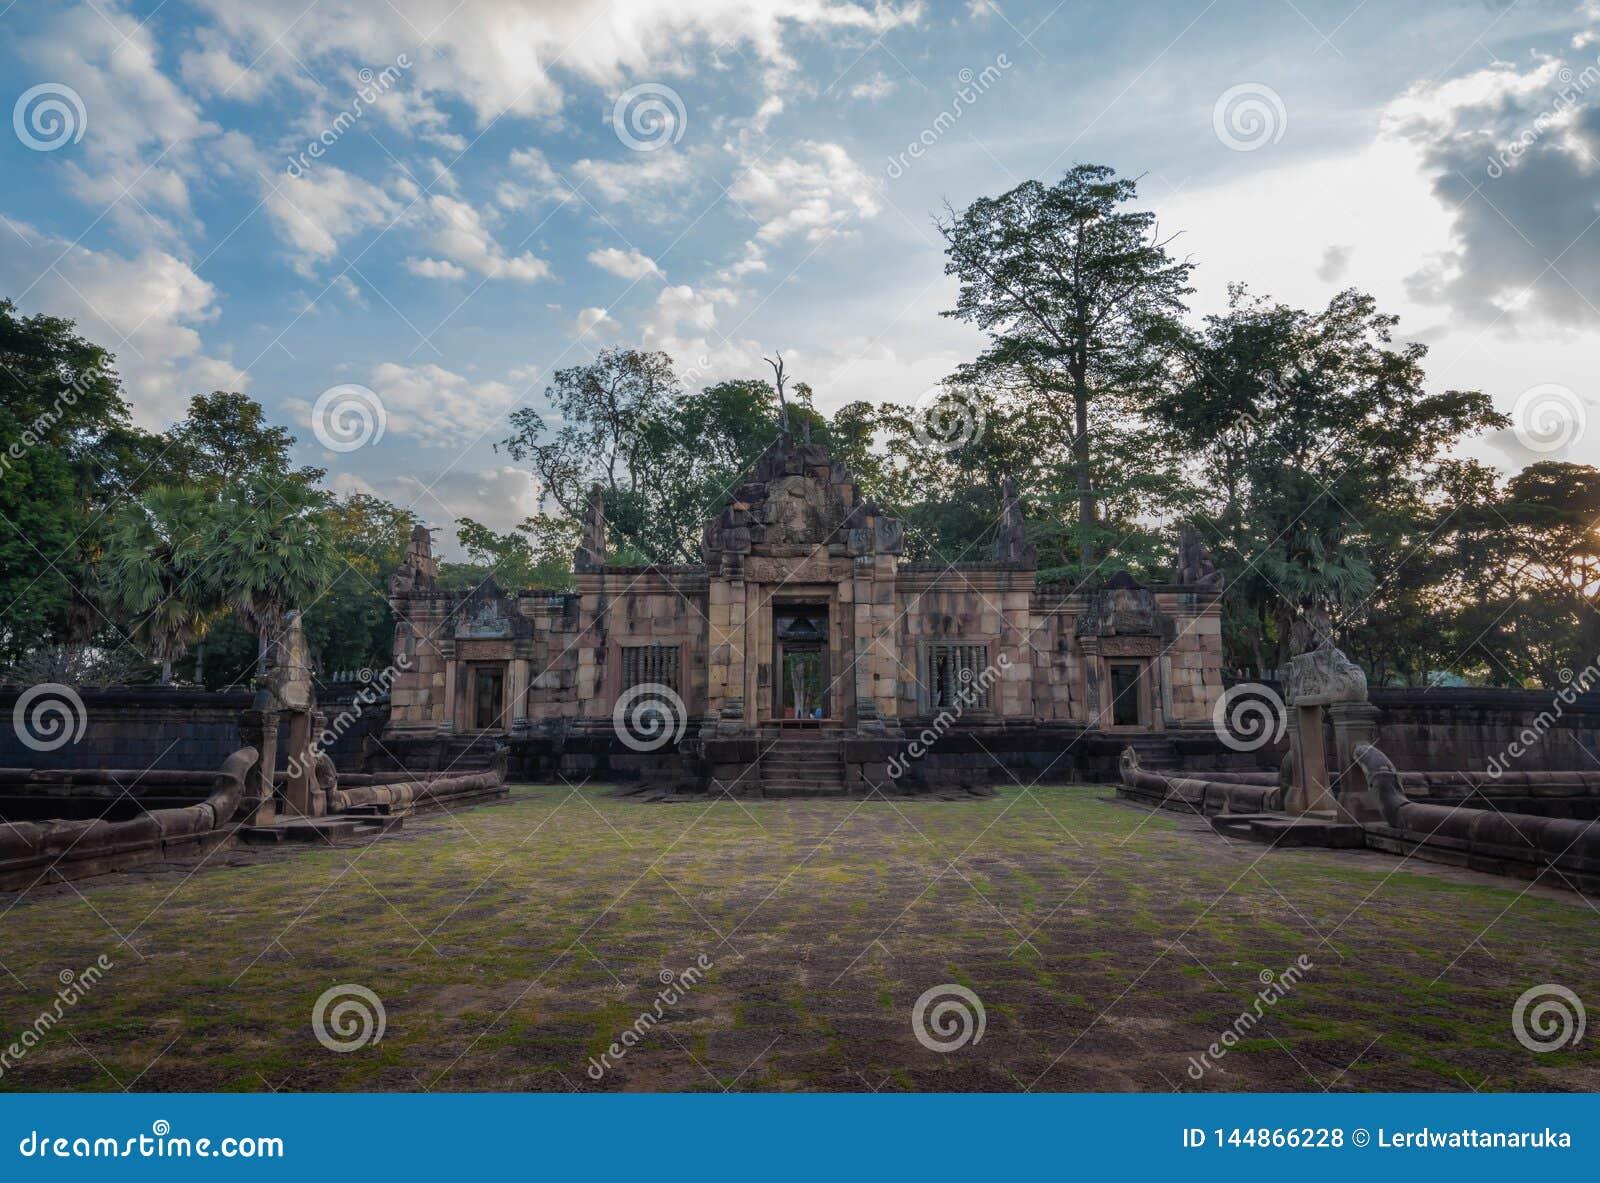 BURIRUM,THAILAND - DECEMBER 07, 2018: PRASARTHIN MUANGTAM or THE STONE CASTLE MUANG TAM at Prakhonchai District